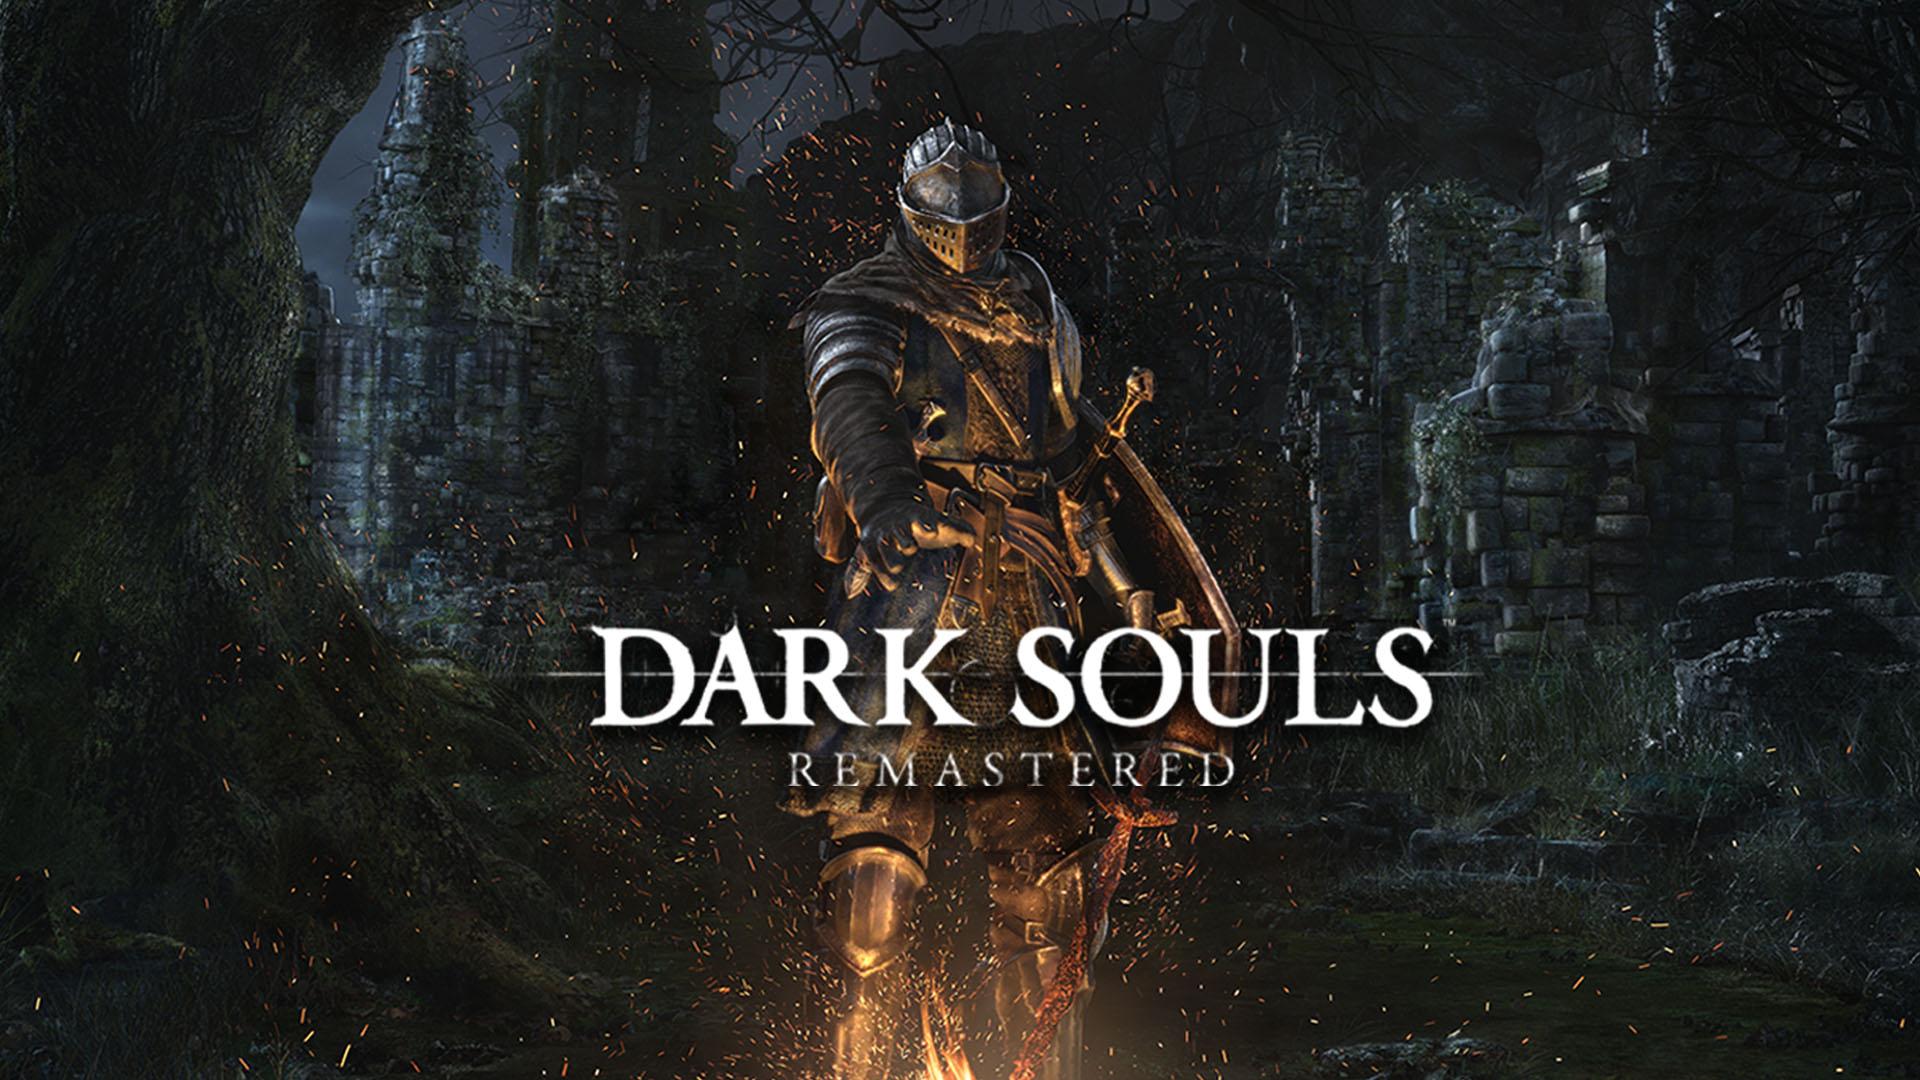 Dark souls remastered nintendo eshop USA